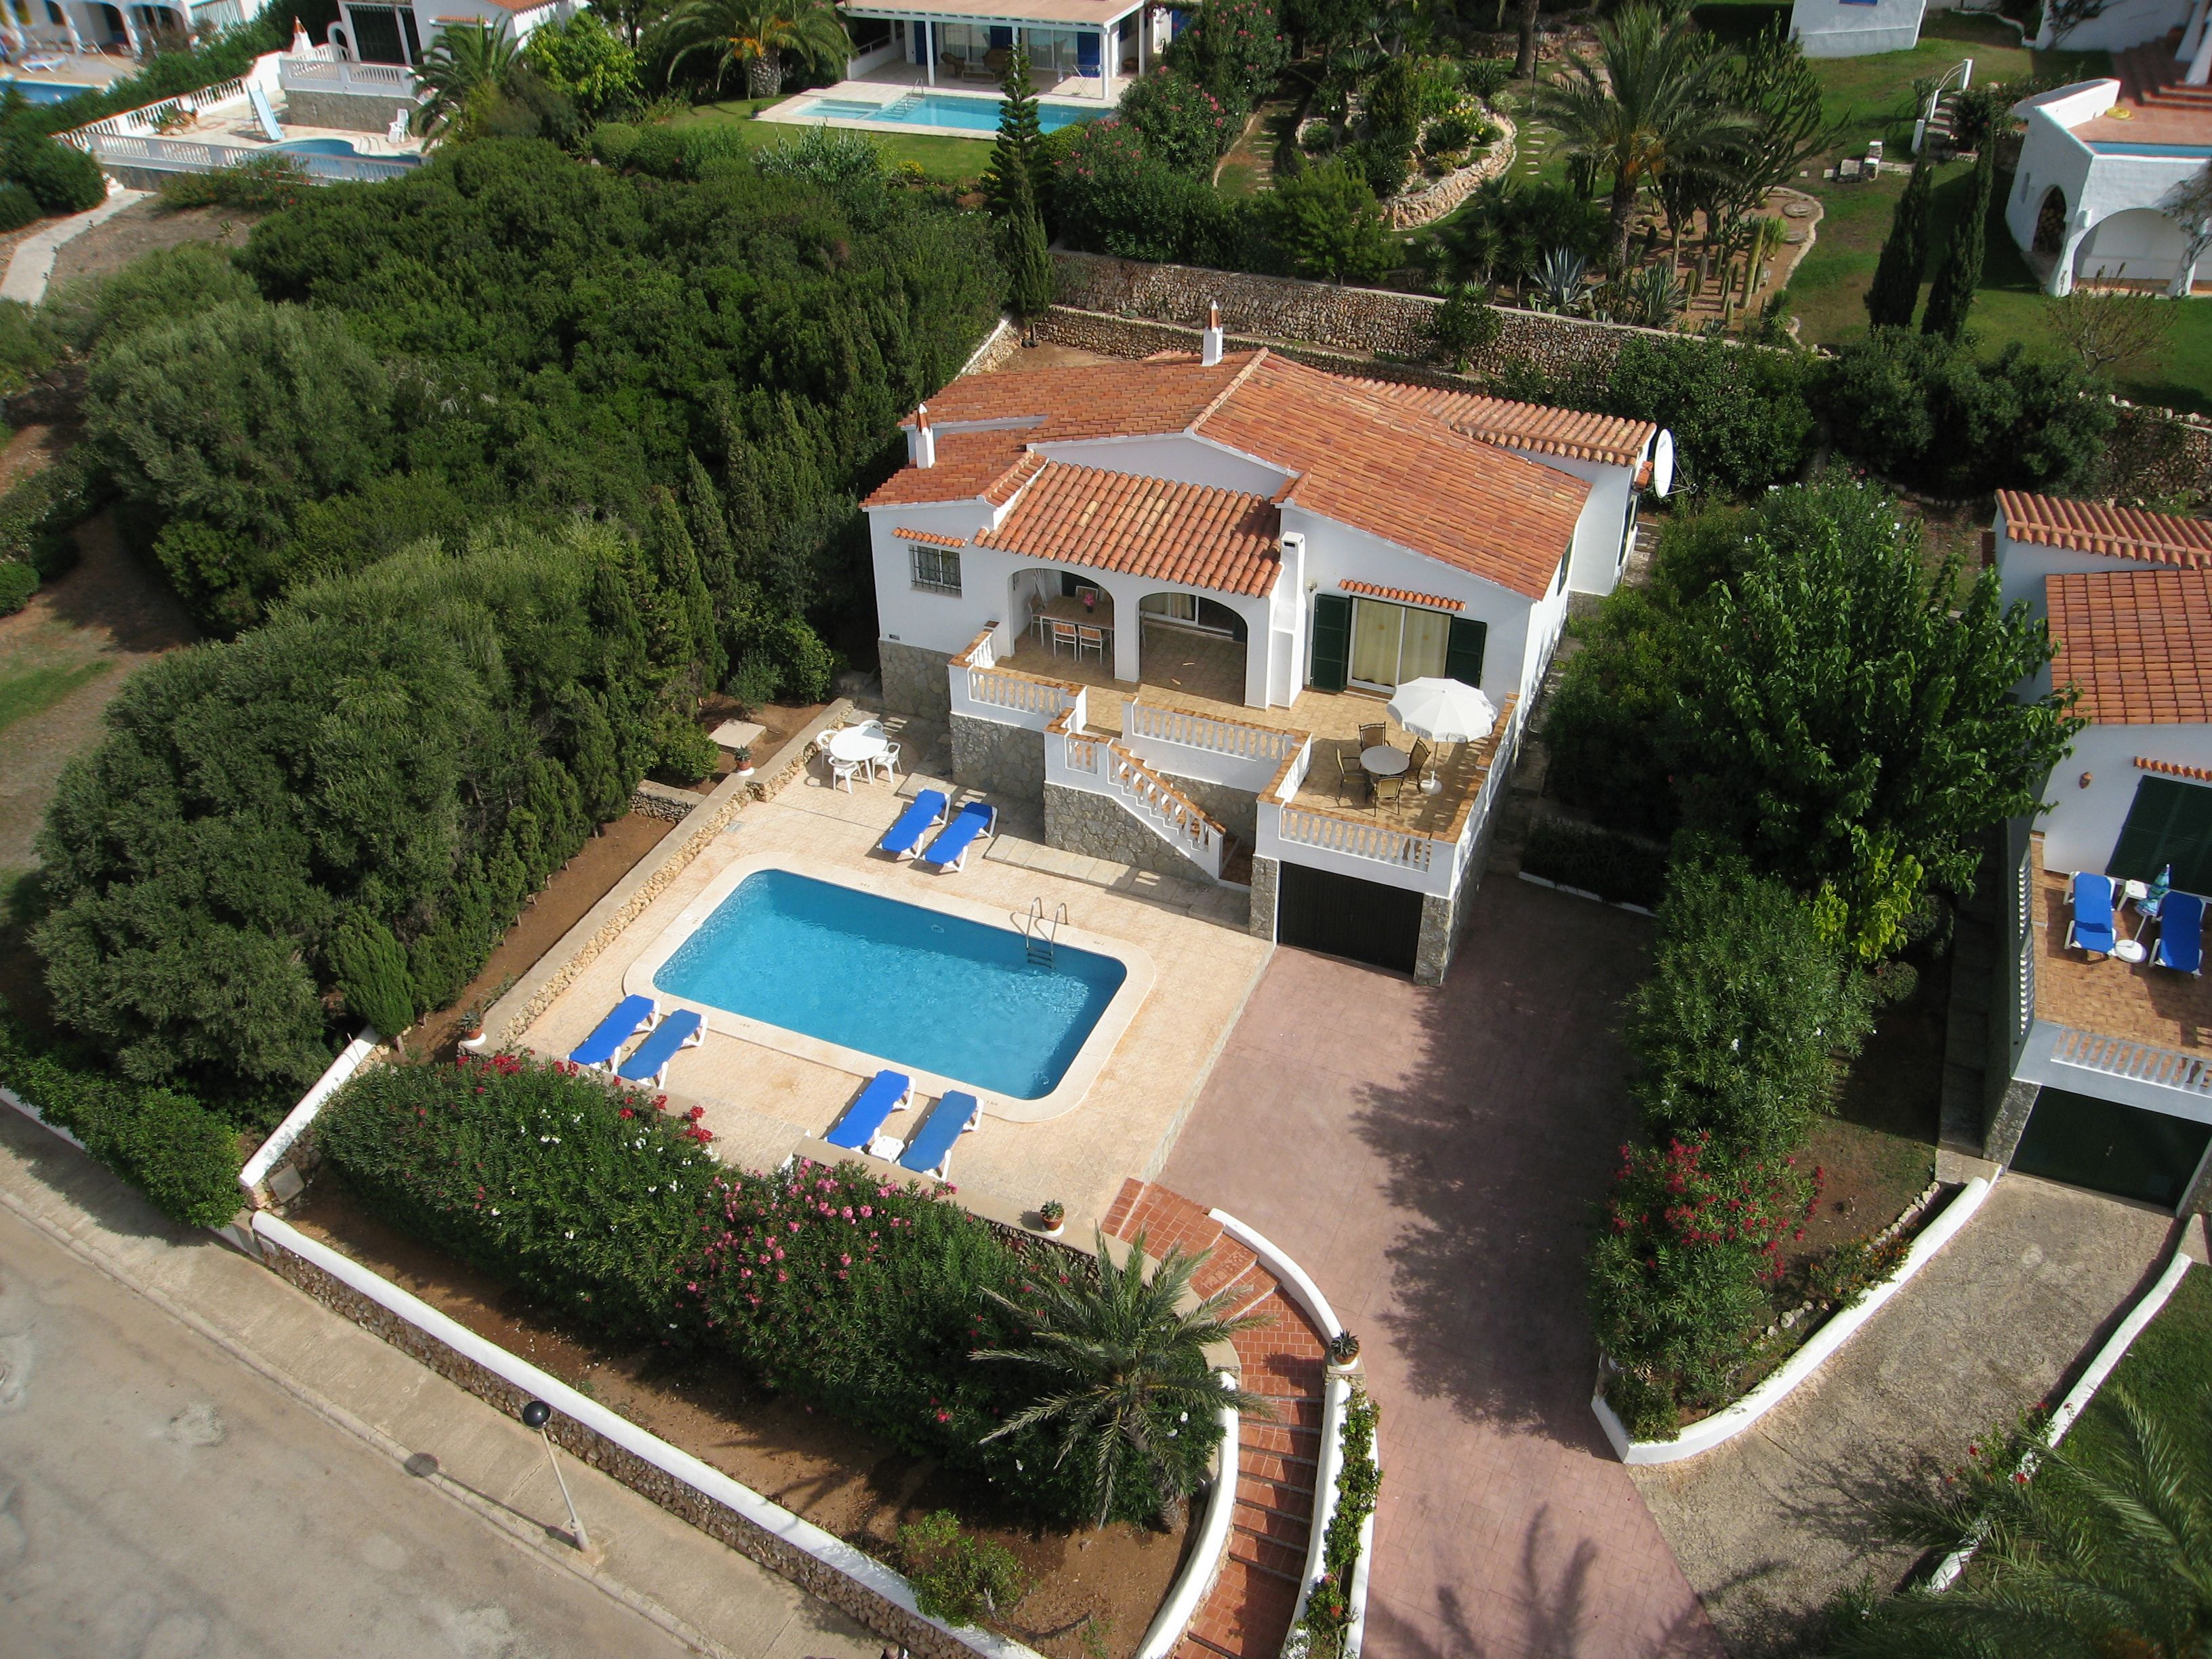 Pin de Menorca Holiday Home en Villa Dreams Piscina